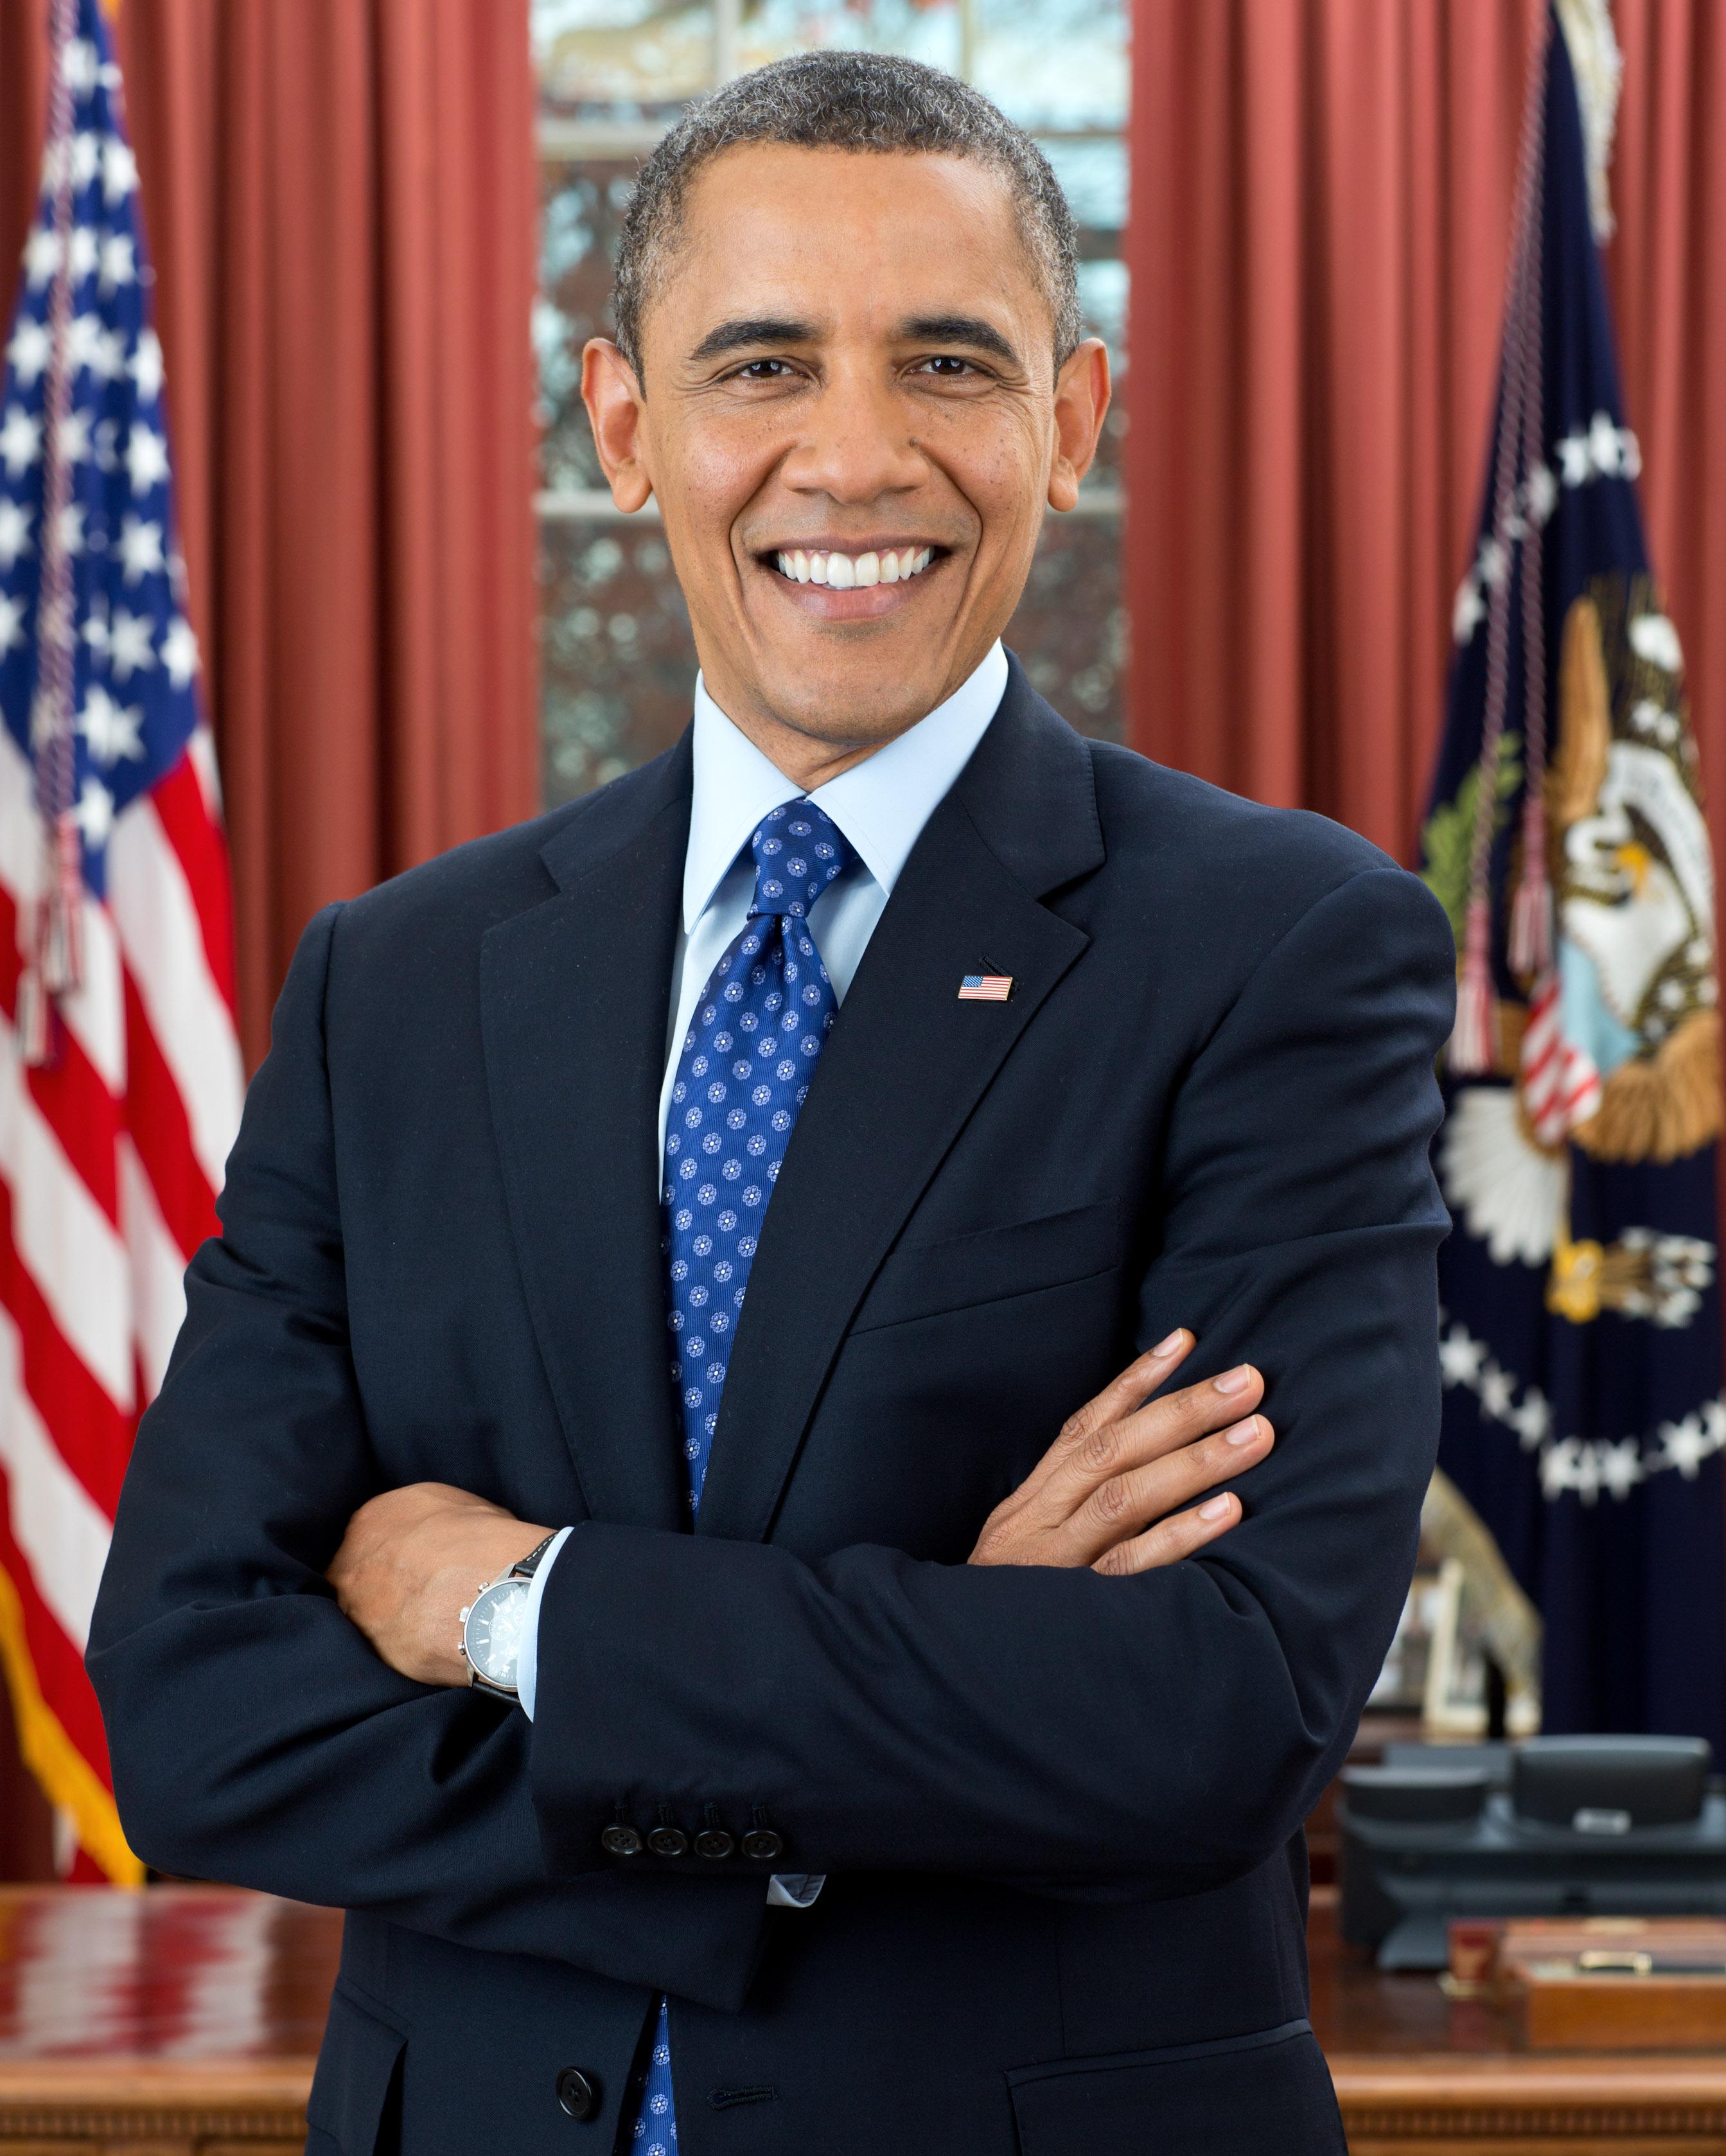 Juventude de Barack Obama inspira dois filmes indies - Pipoca ...